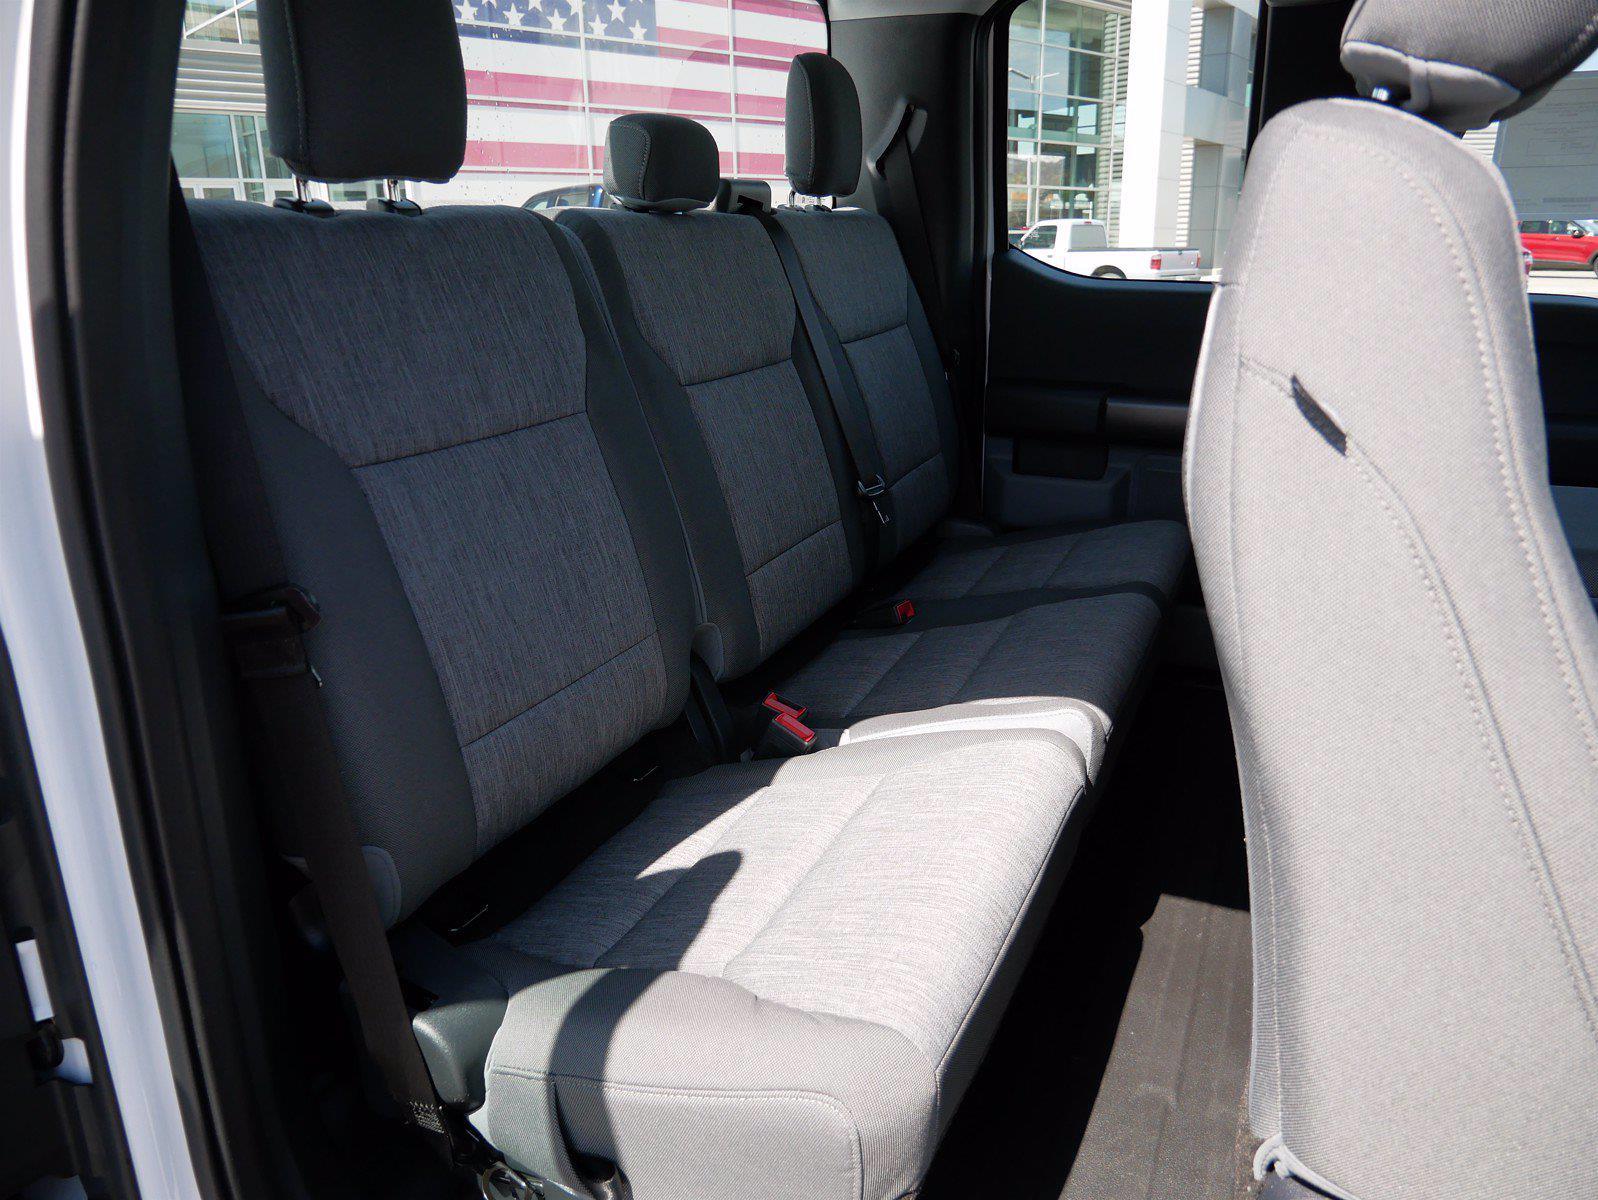 2021 Ford F-150 Super Cab 4x4, Pickup #64068 - photo 27